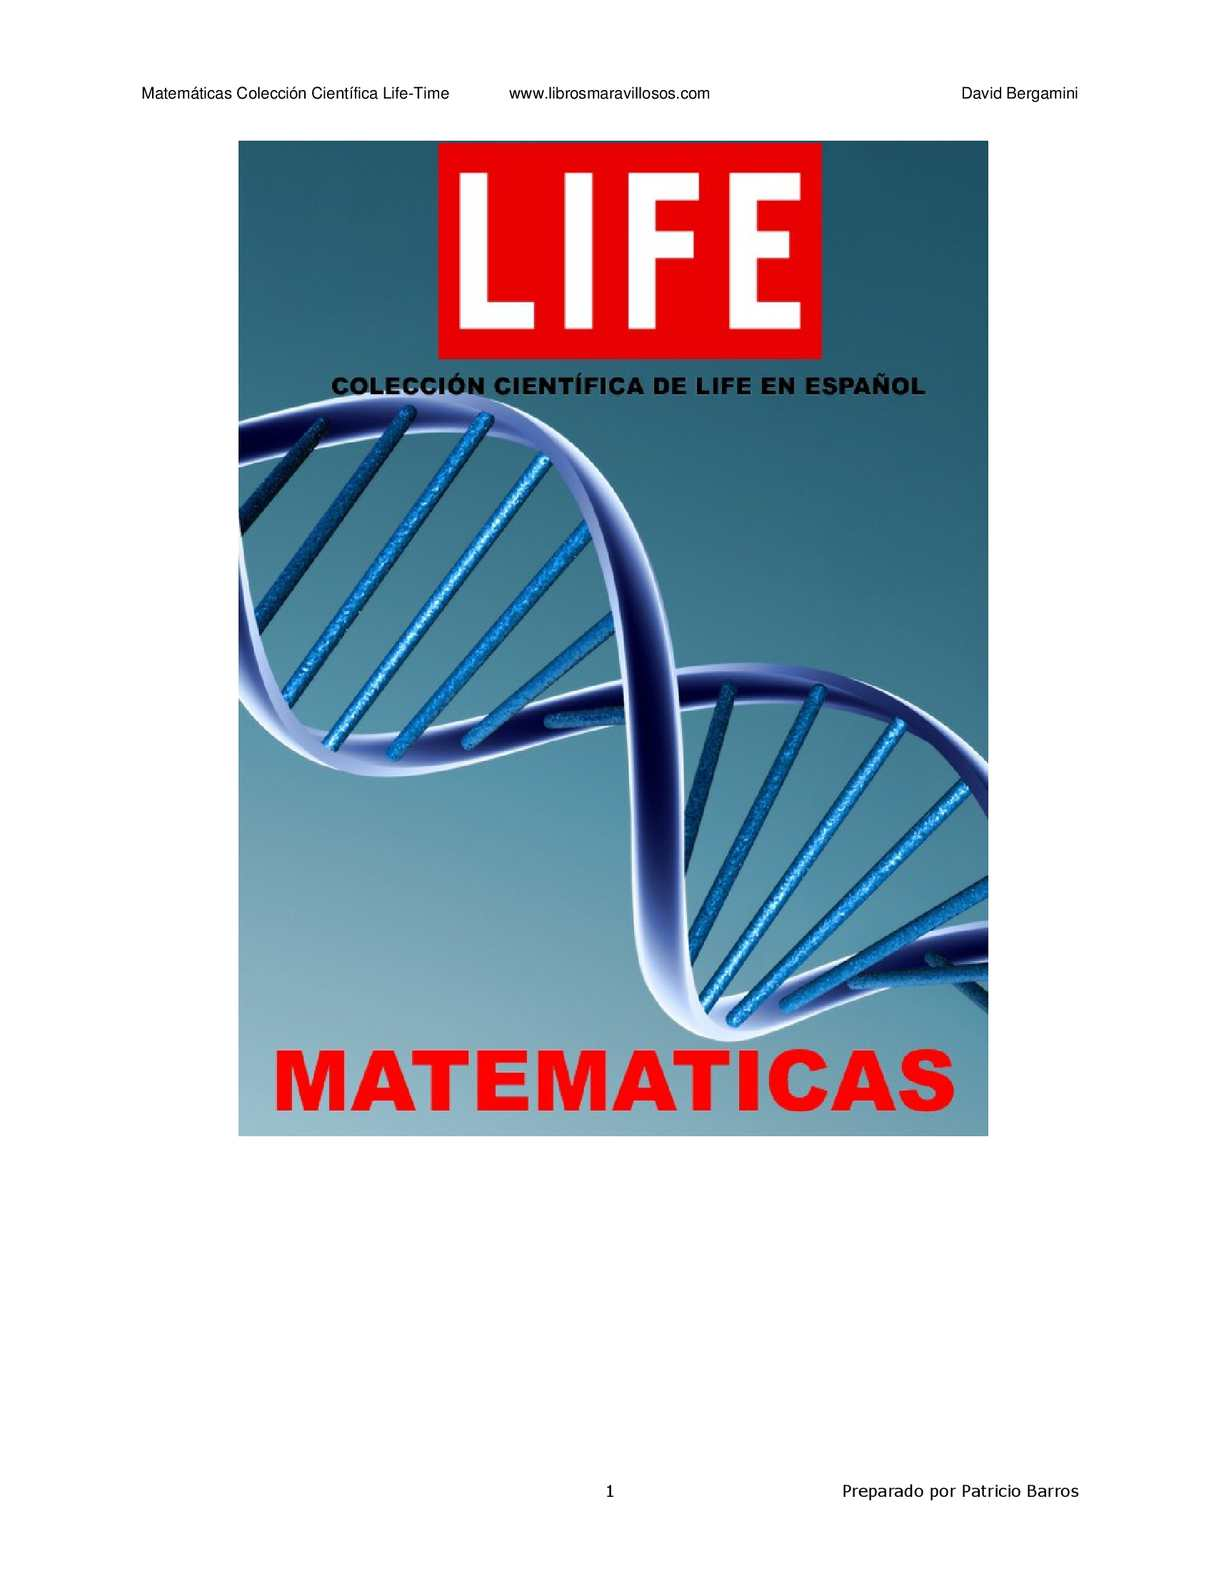 Calaméo - Matematicas Coleccion Cientifica Life Time